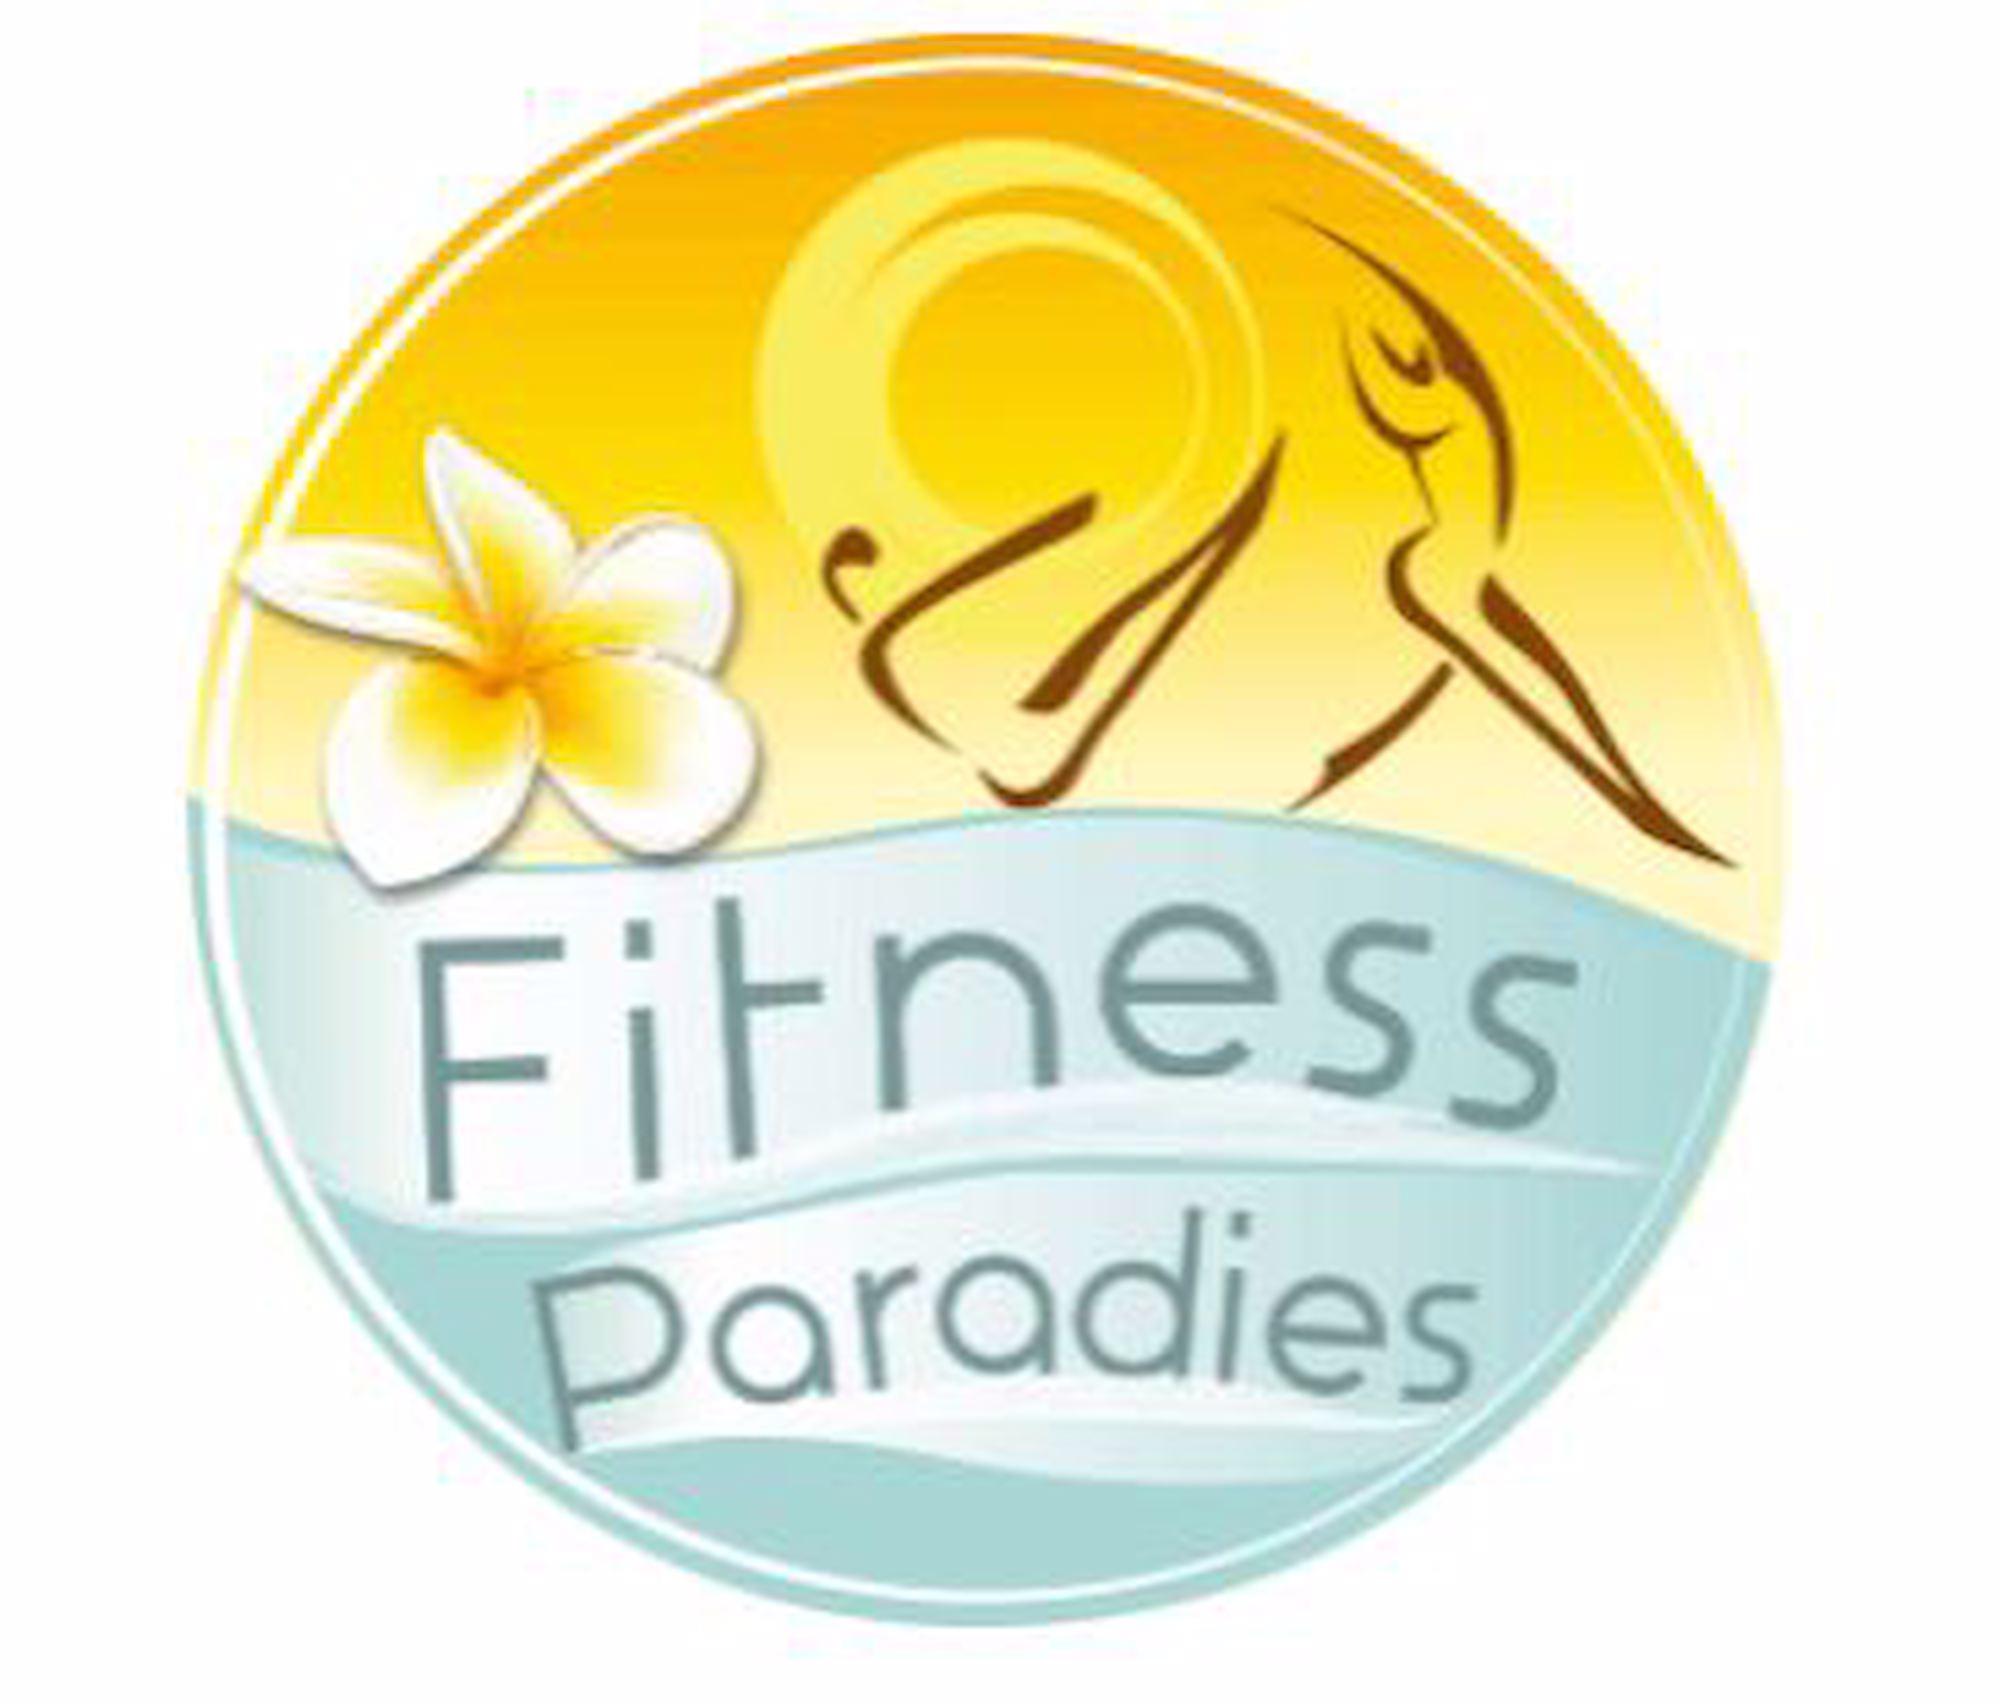 fitnessparadies